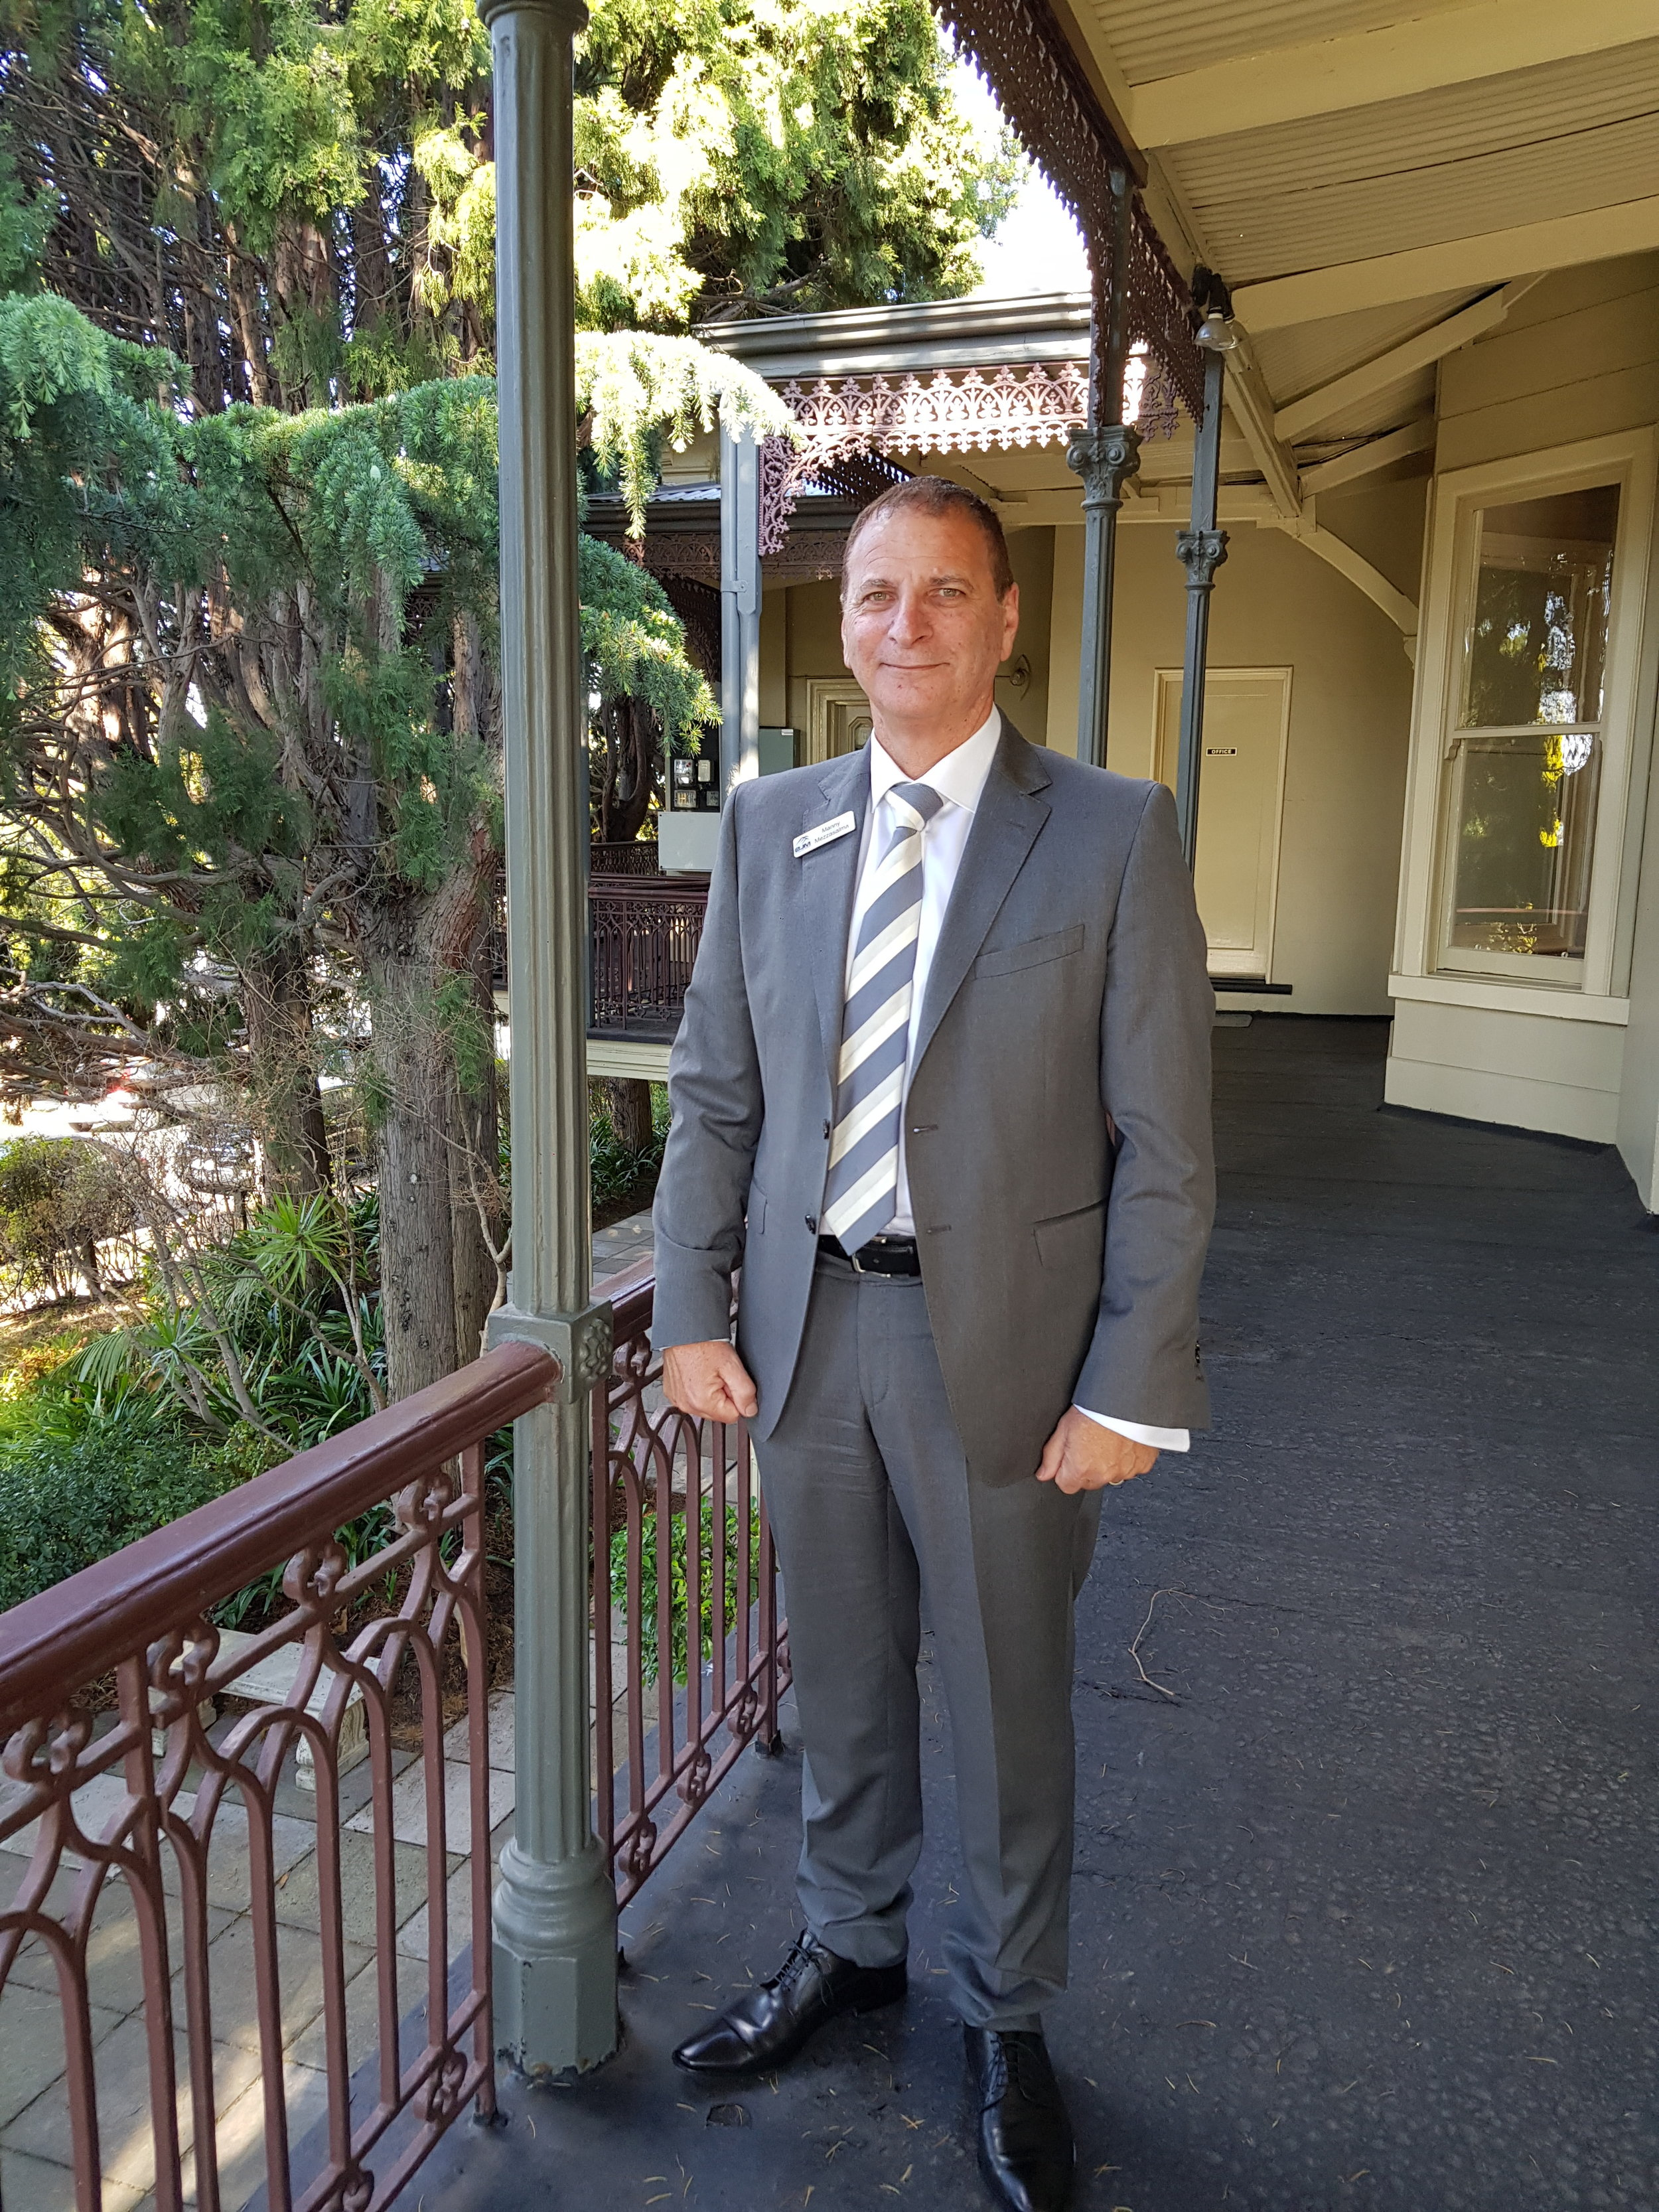 Manny mezzasalma -CEO, Adviser  Email: m.mezzasalma@ejm.com.au  Mobile: 0433 140 411